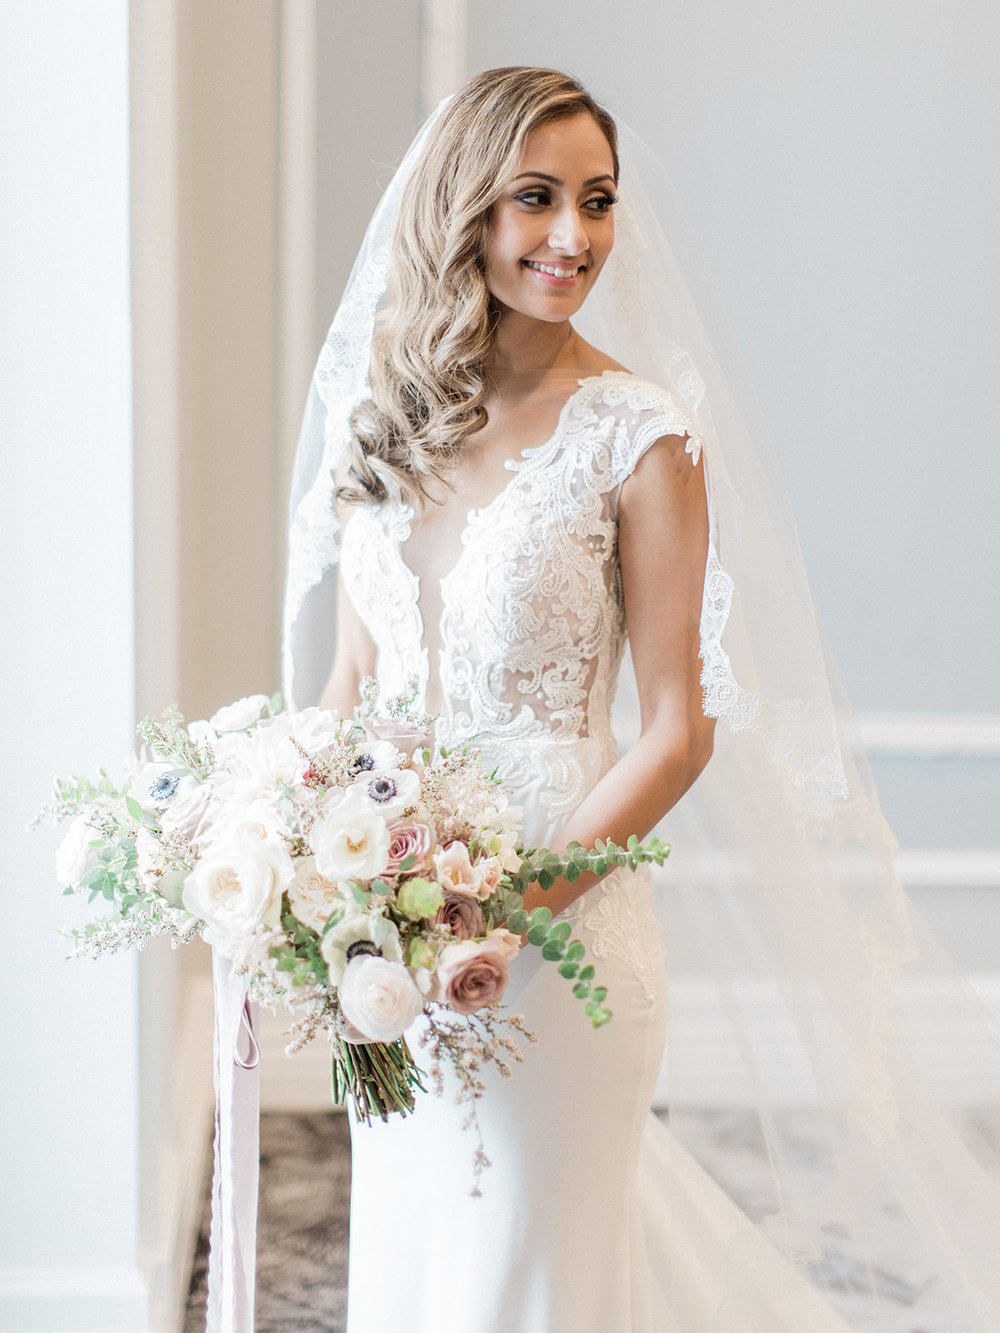 LisaCatherinePhotography_Jasmeen&Darren_Wedding-1064_websize.jpg